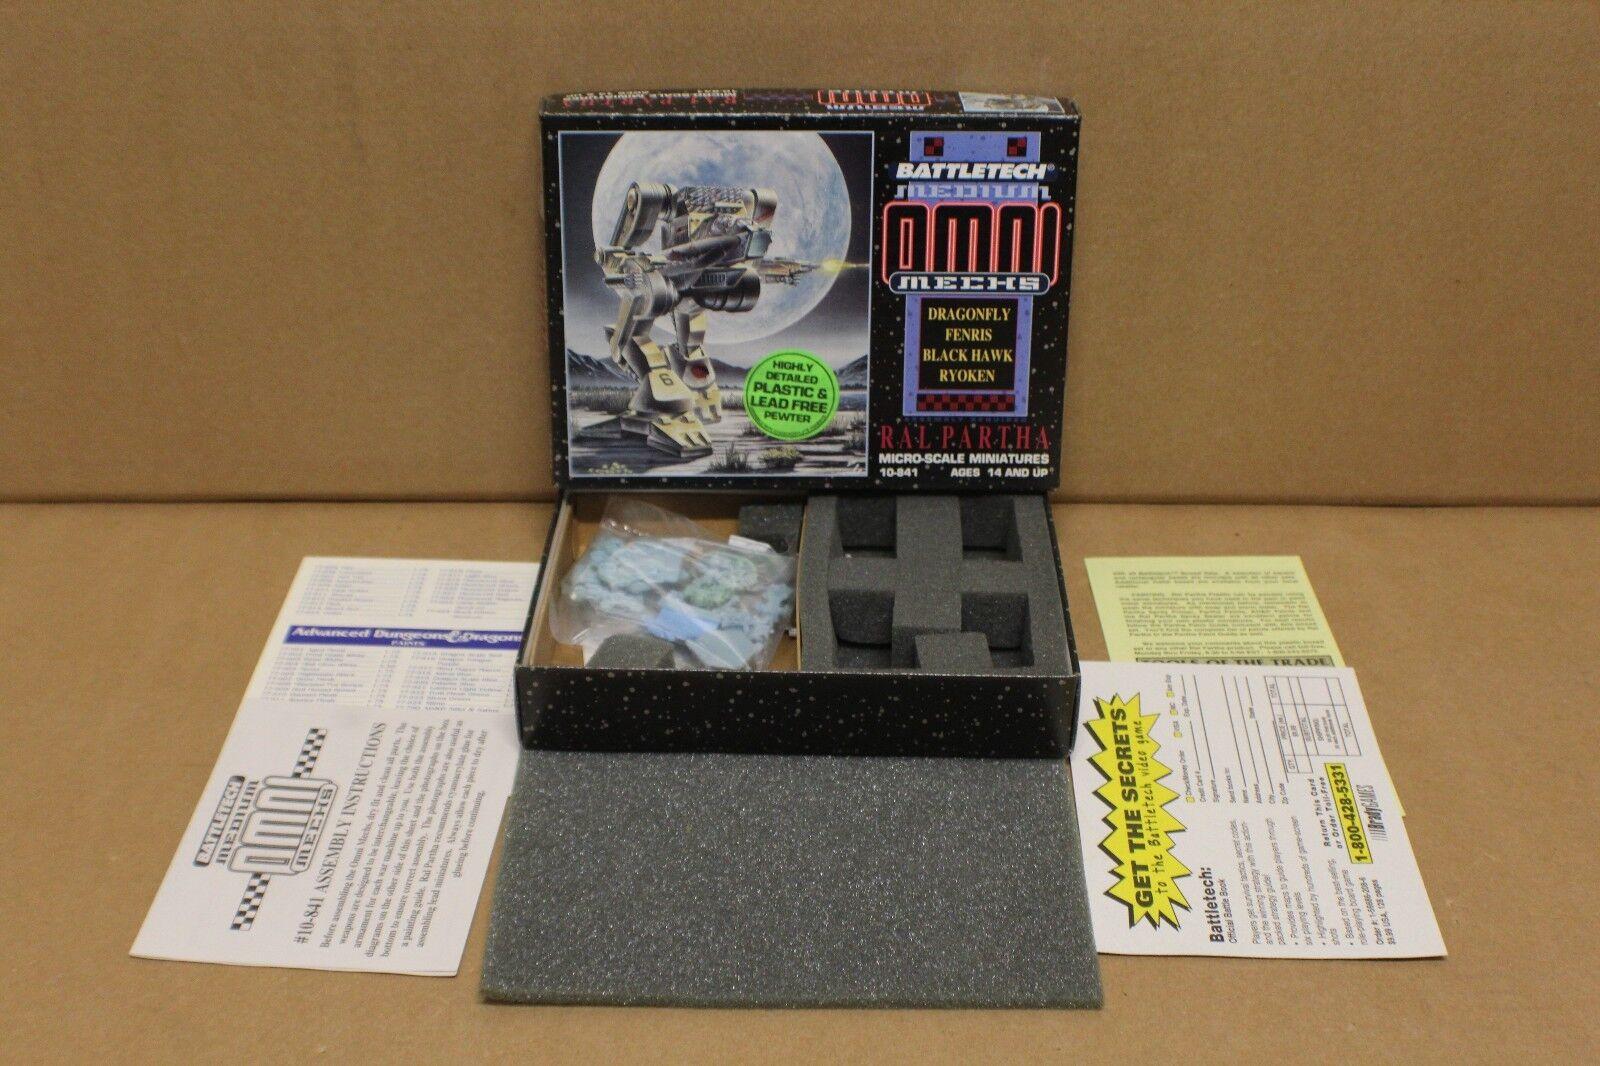 Der partha battletech mini - medium omni mechs 10-841 a2